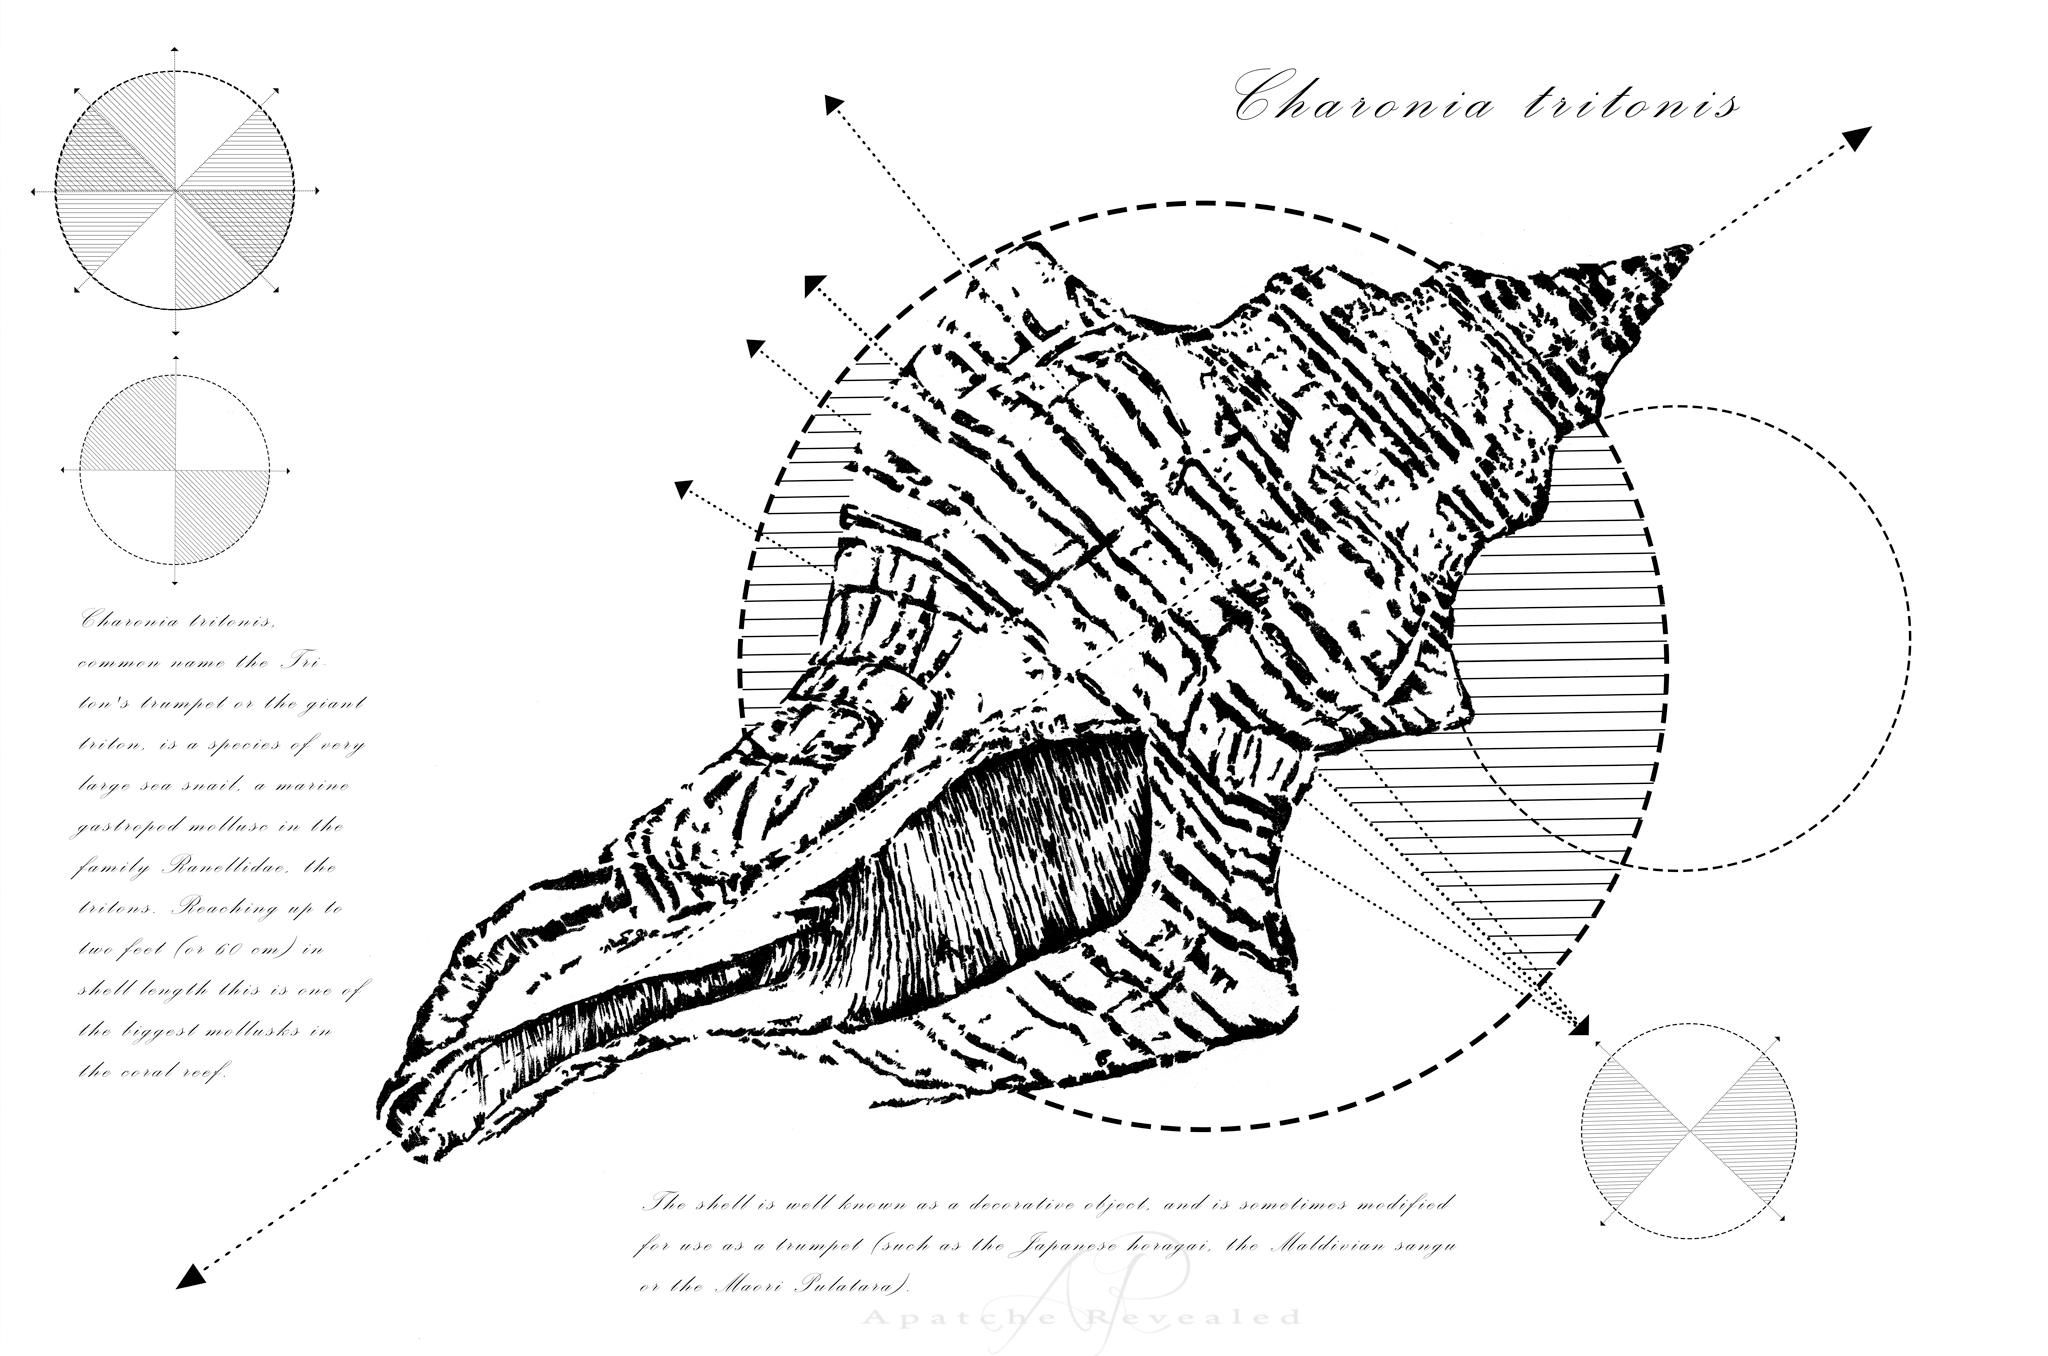 Geometry of a Charonia tritonis